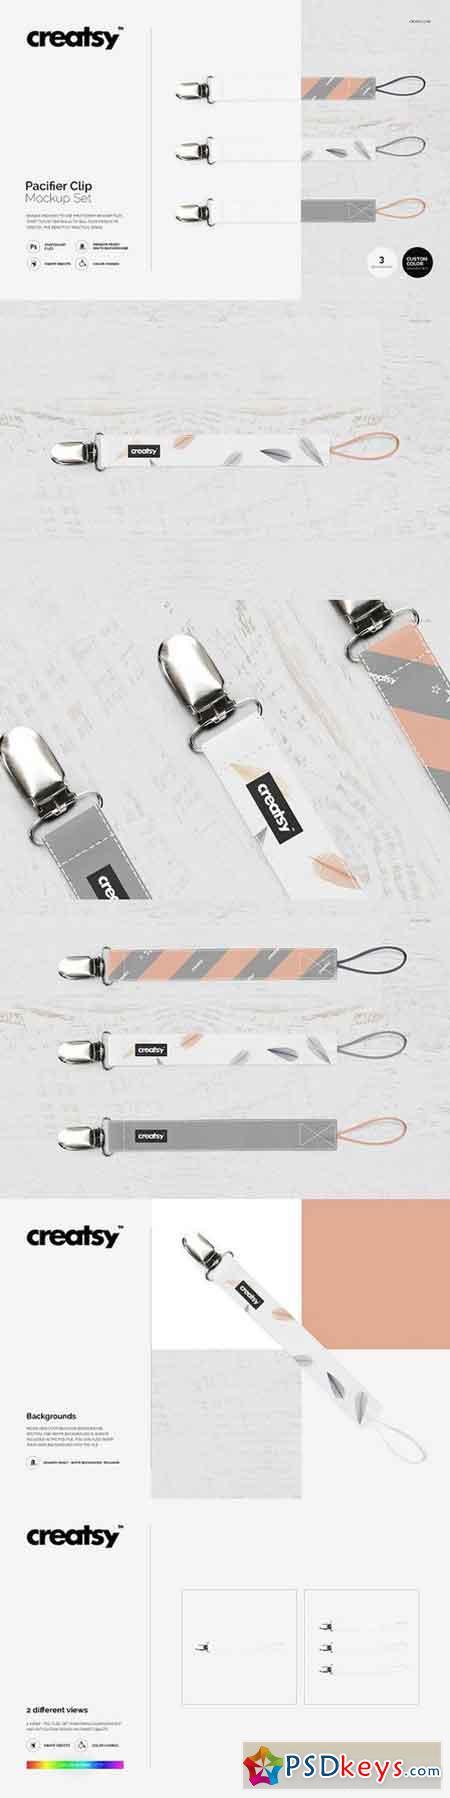 Pacifier Clip Mockup Set 1361495